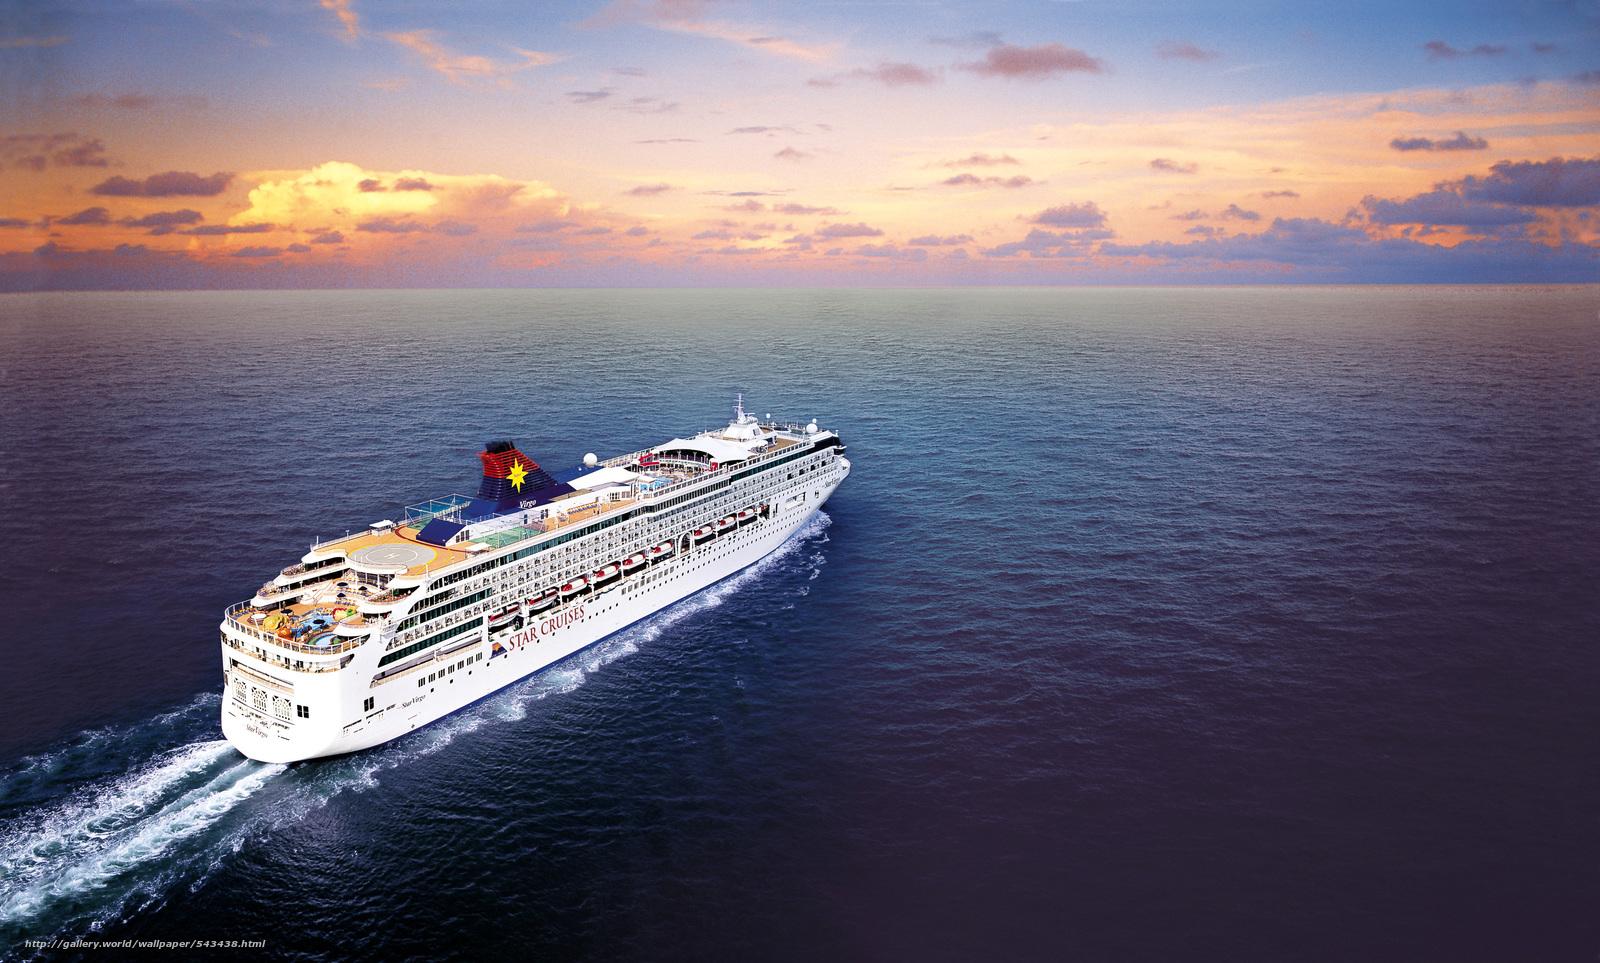 Download wallpaper Star Cruises,  SuperStar Virgo,  Ship free desktop wallpaper in the resolution 3543x2133 — picture №543438